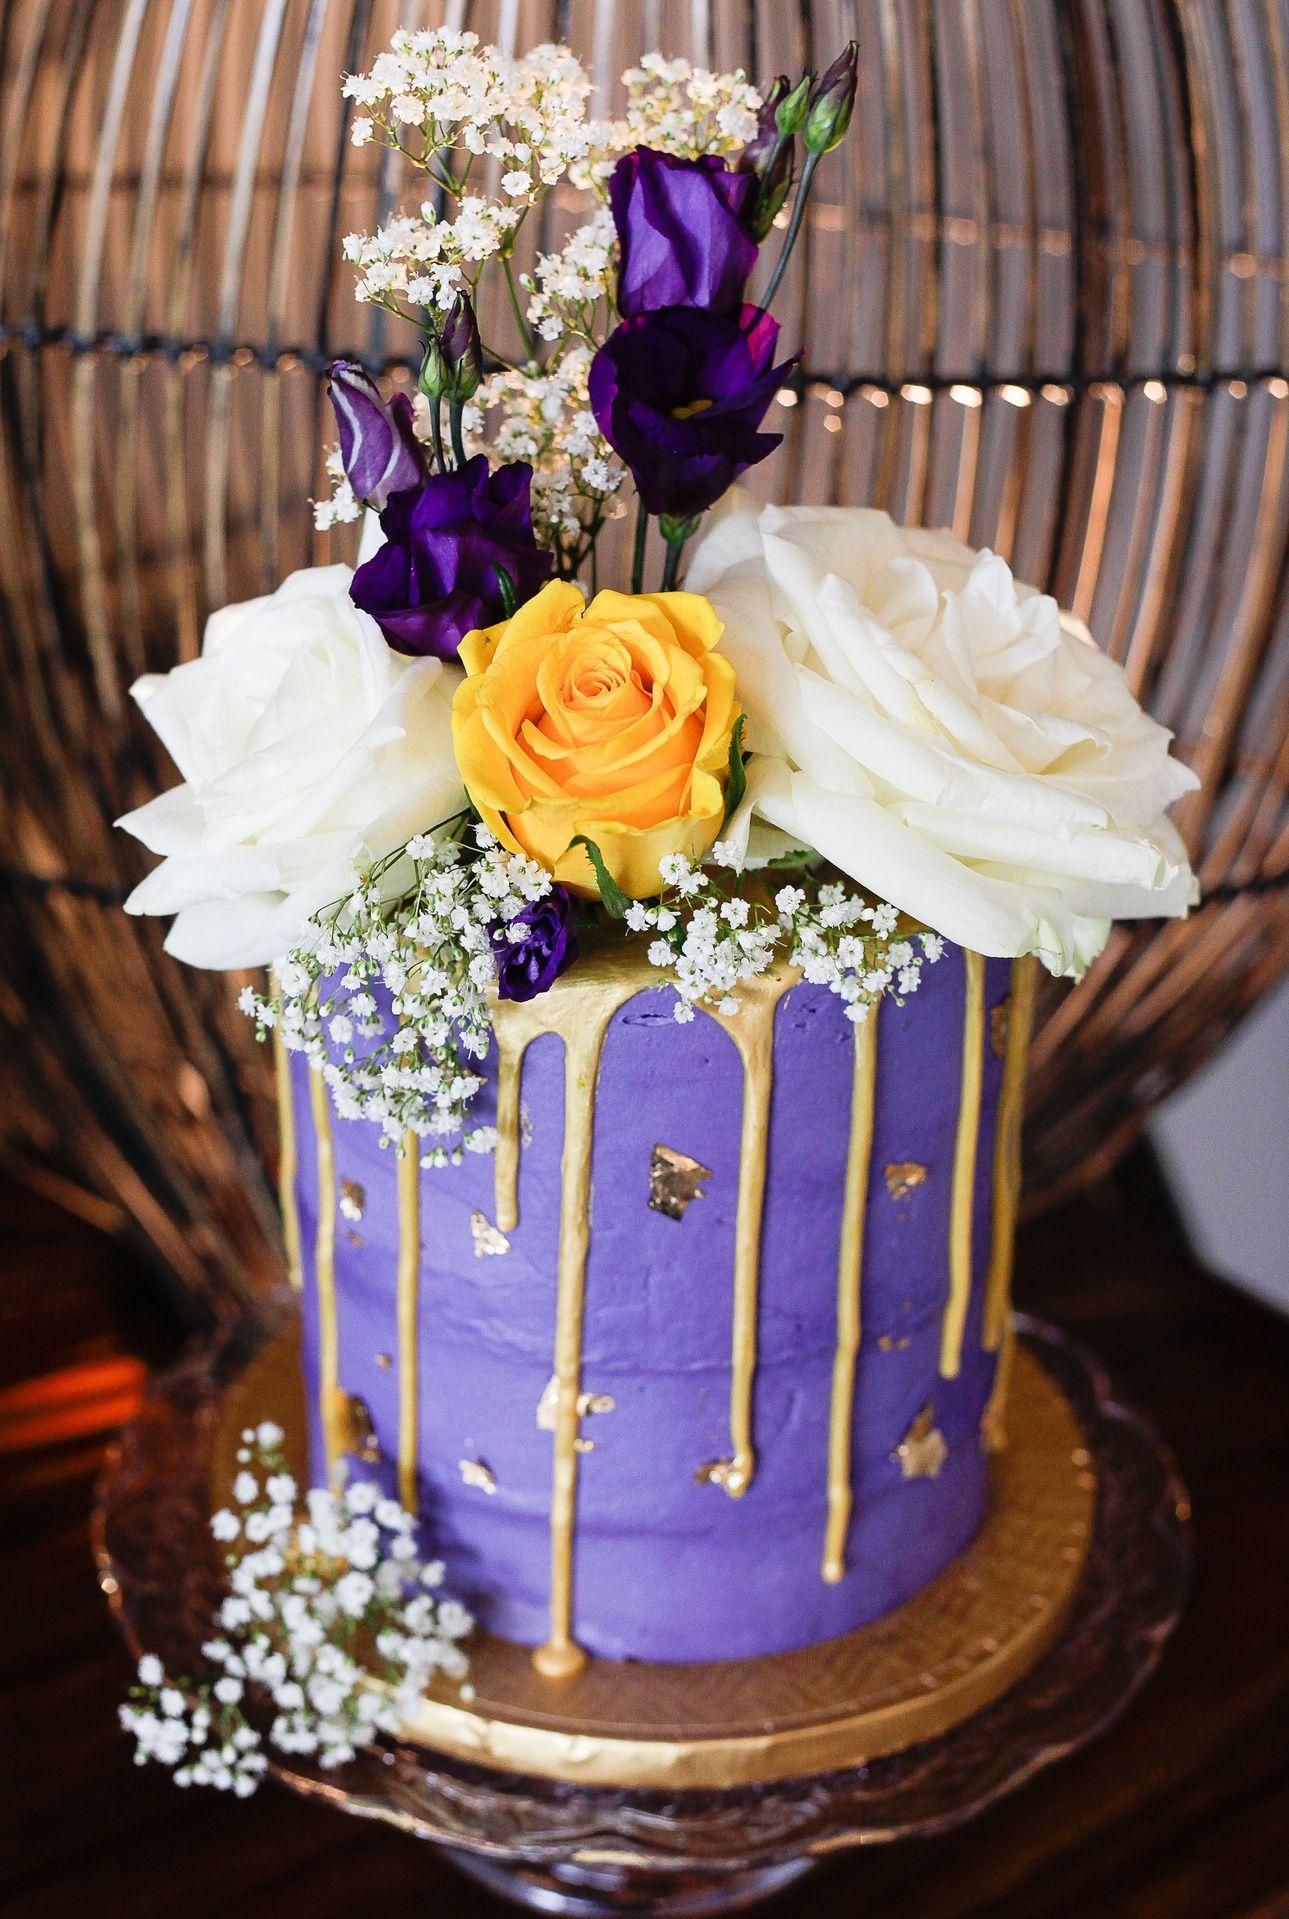 Artisana - Bespoke Cakes Lilac Buttercream Lemon Drizzle ...